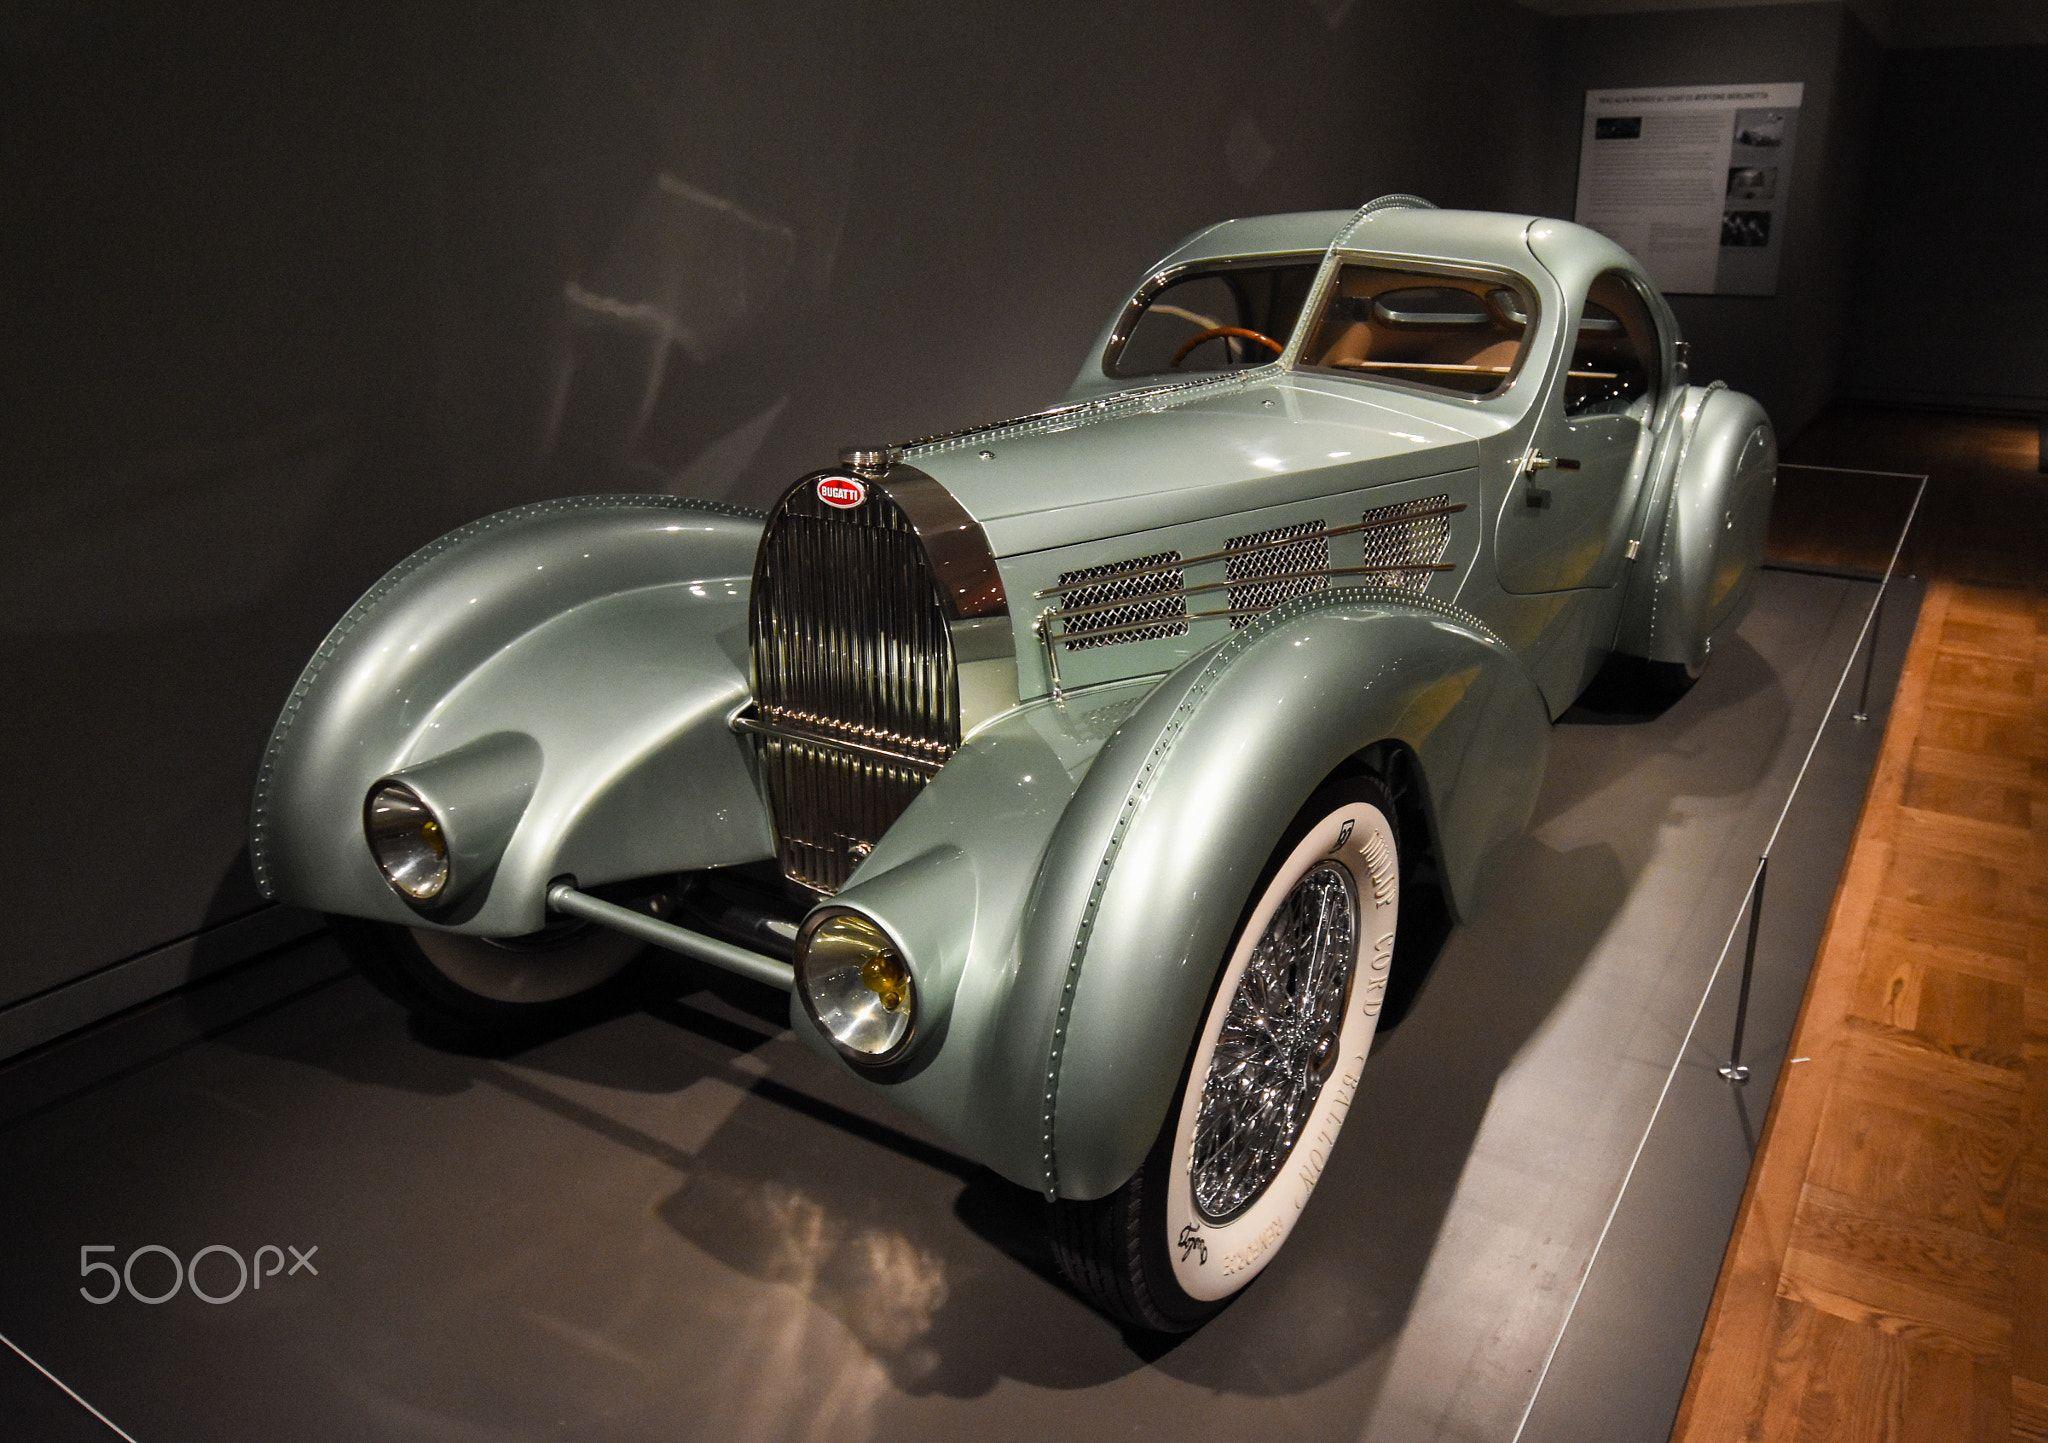 1937 bugatti type 57 aerolithe the 1937 bugatti type 57 aerolithe